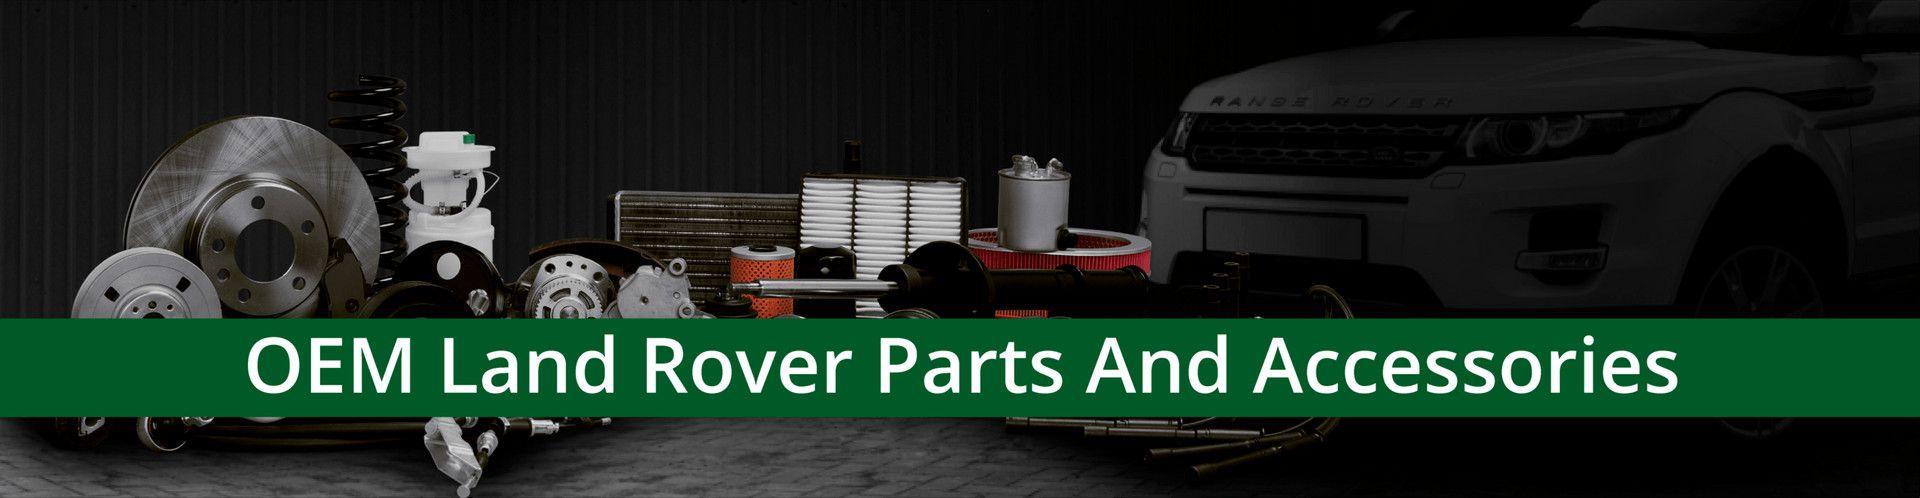 OEM Land Rover Parts| Land Rover Virginia Beach